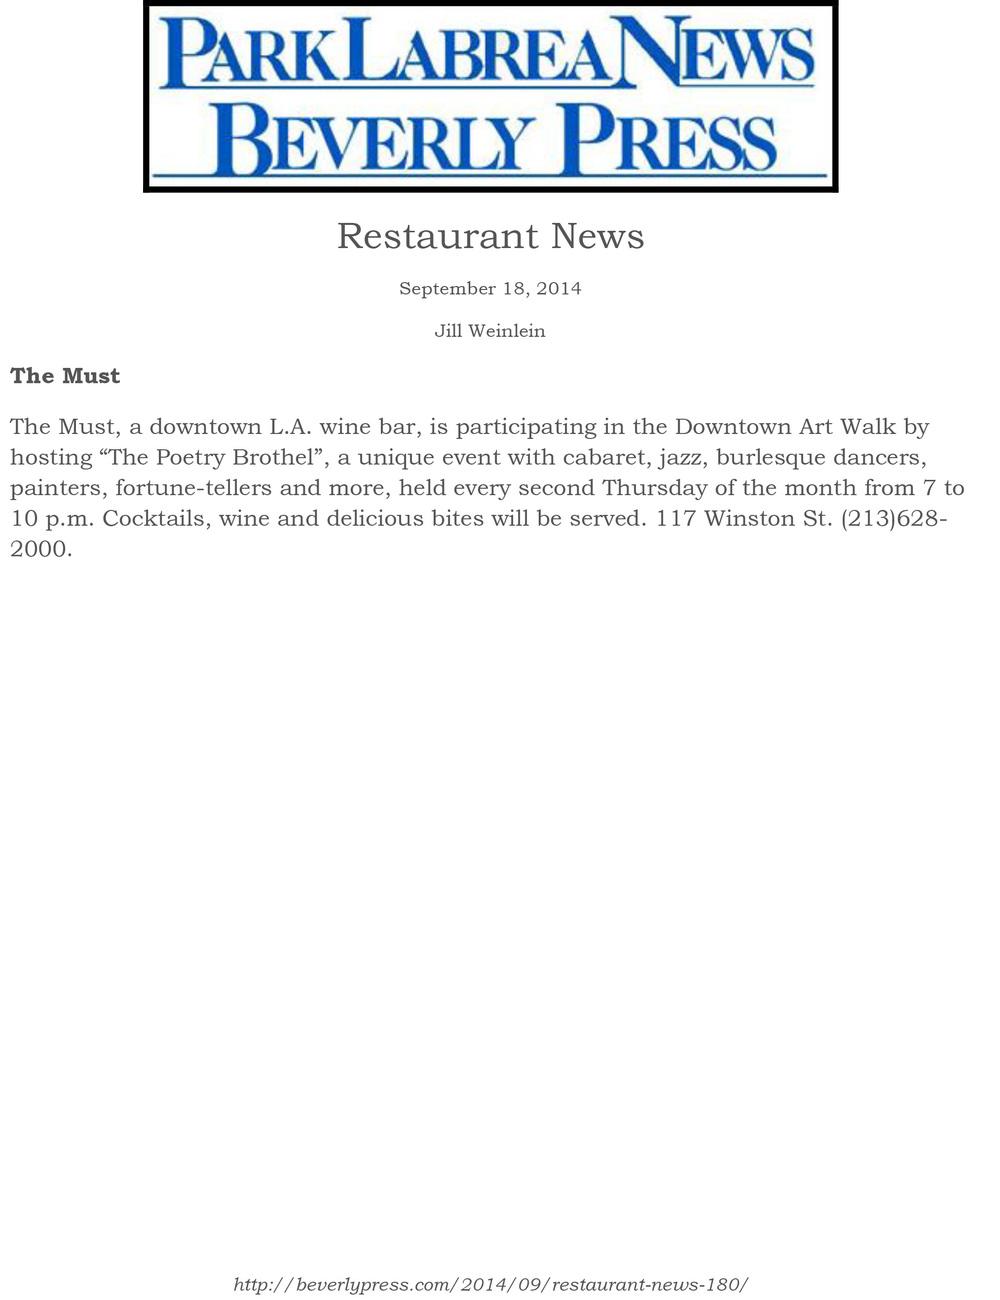 ParkLaBreaNewsBevPress - TheMust - 9.18.14.jpg